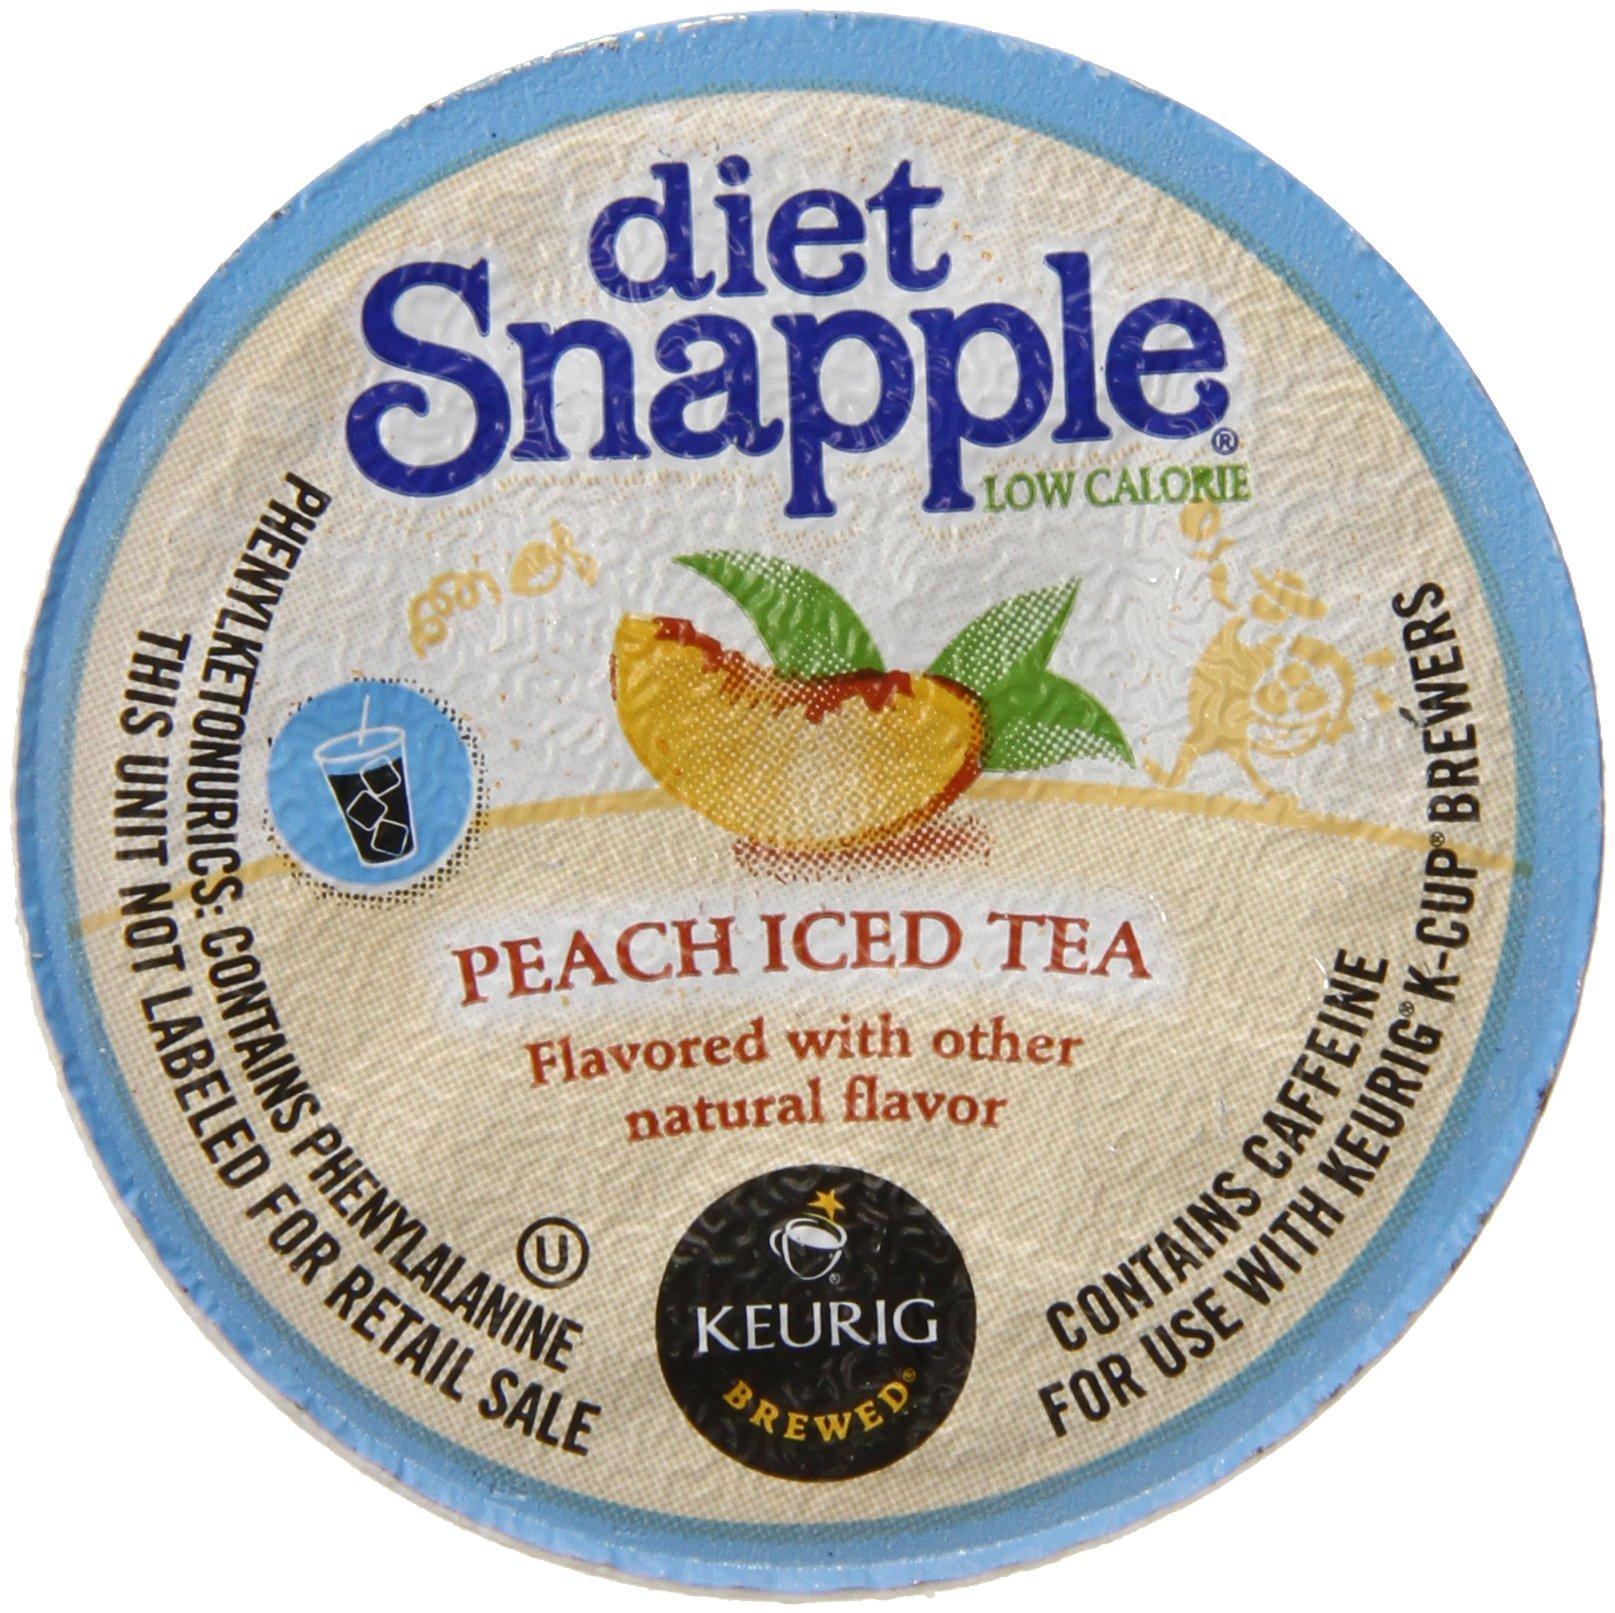 Snapple Diet Iced Tea, Peach, 22 Count Net Wt. 3.1 oz by Snapple